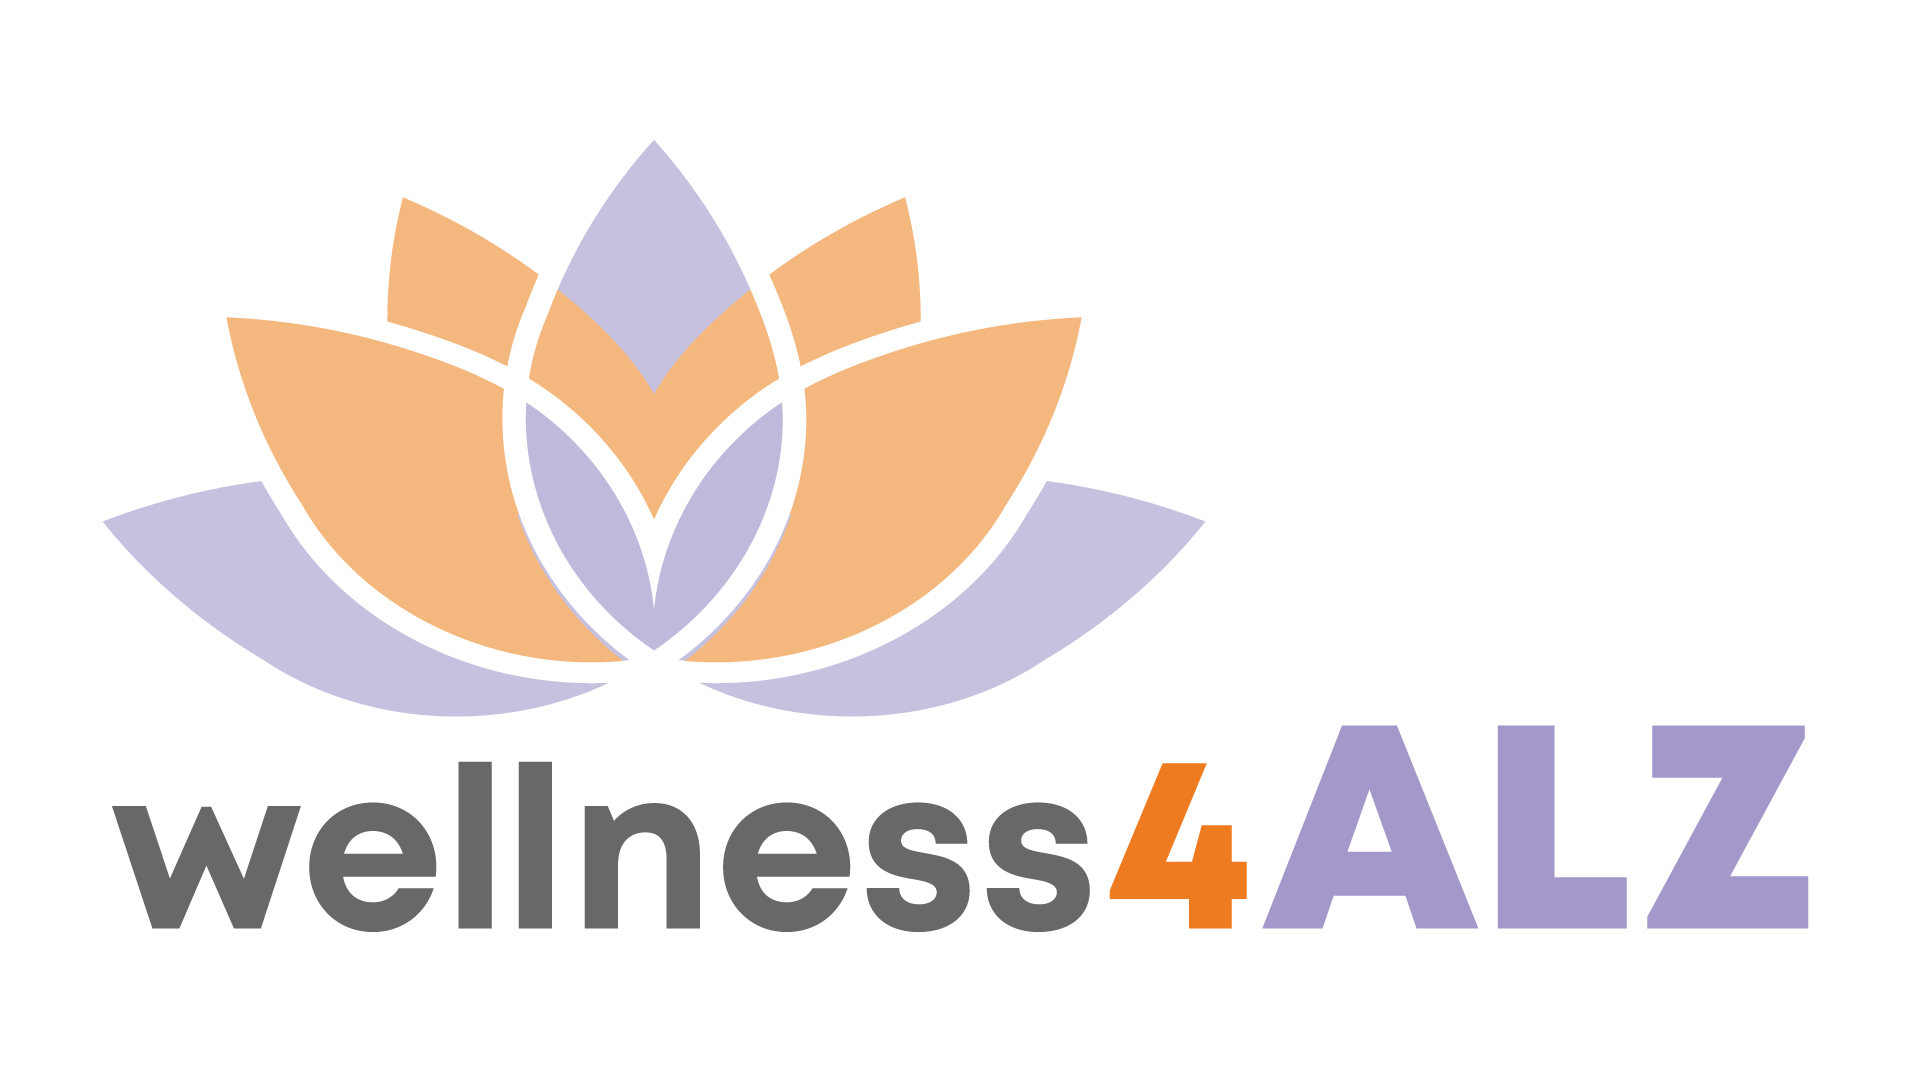 wellness4ALZ challenge